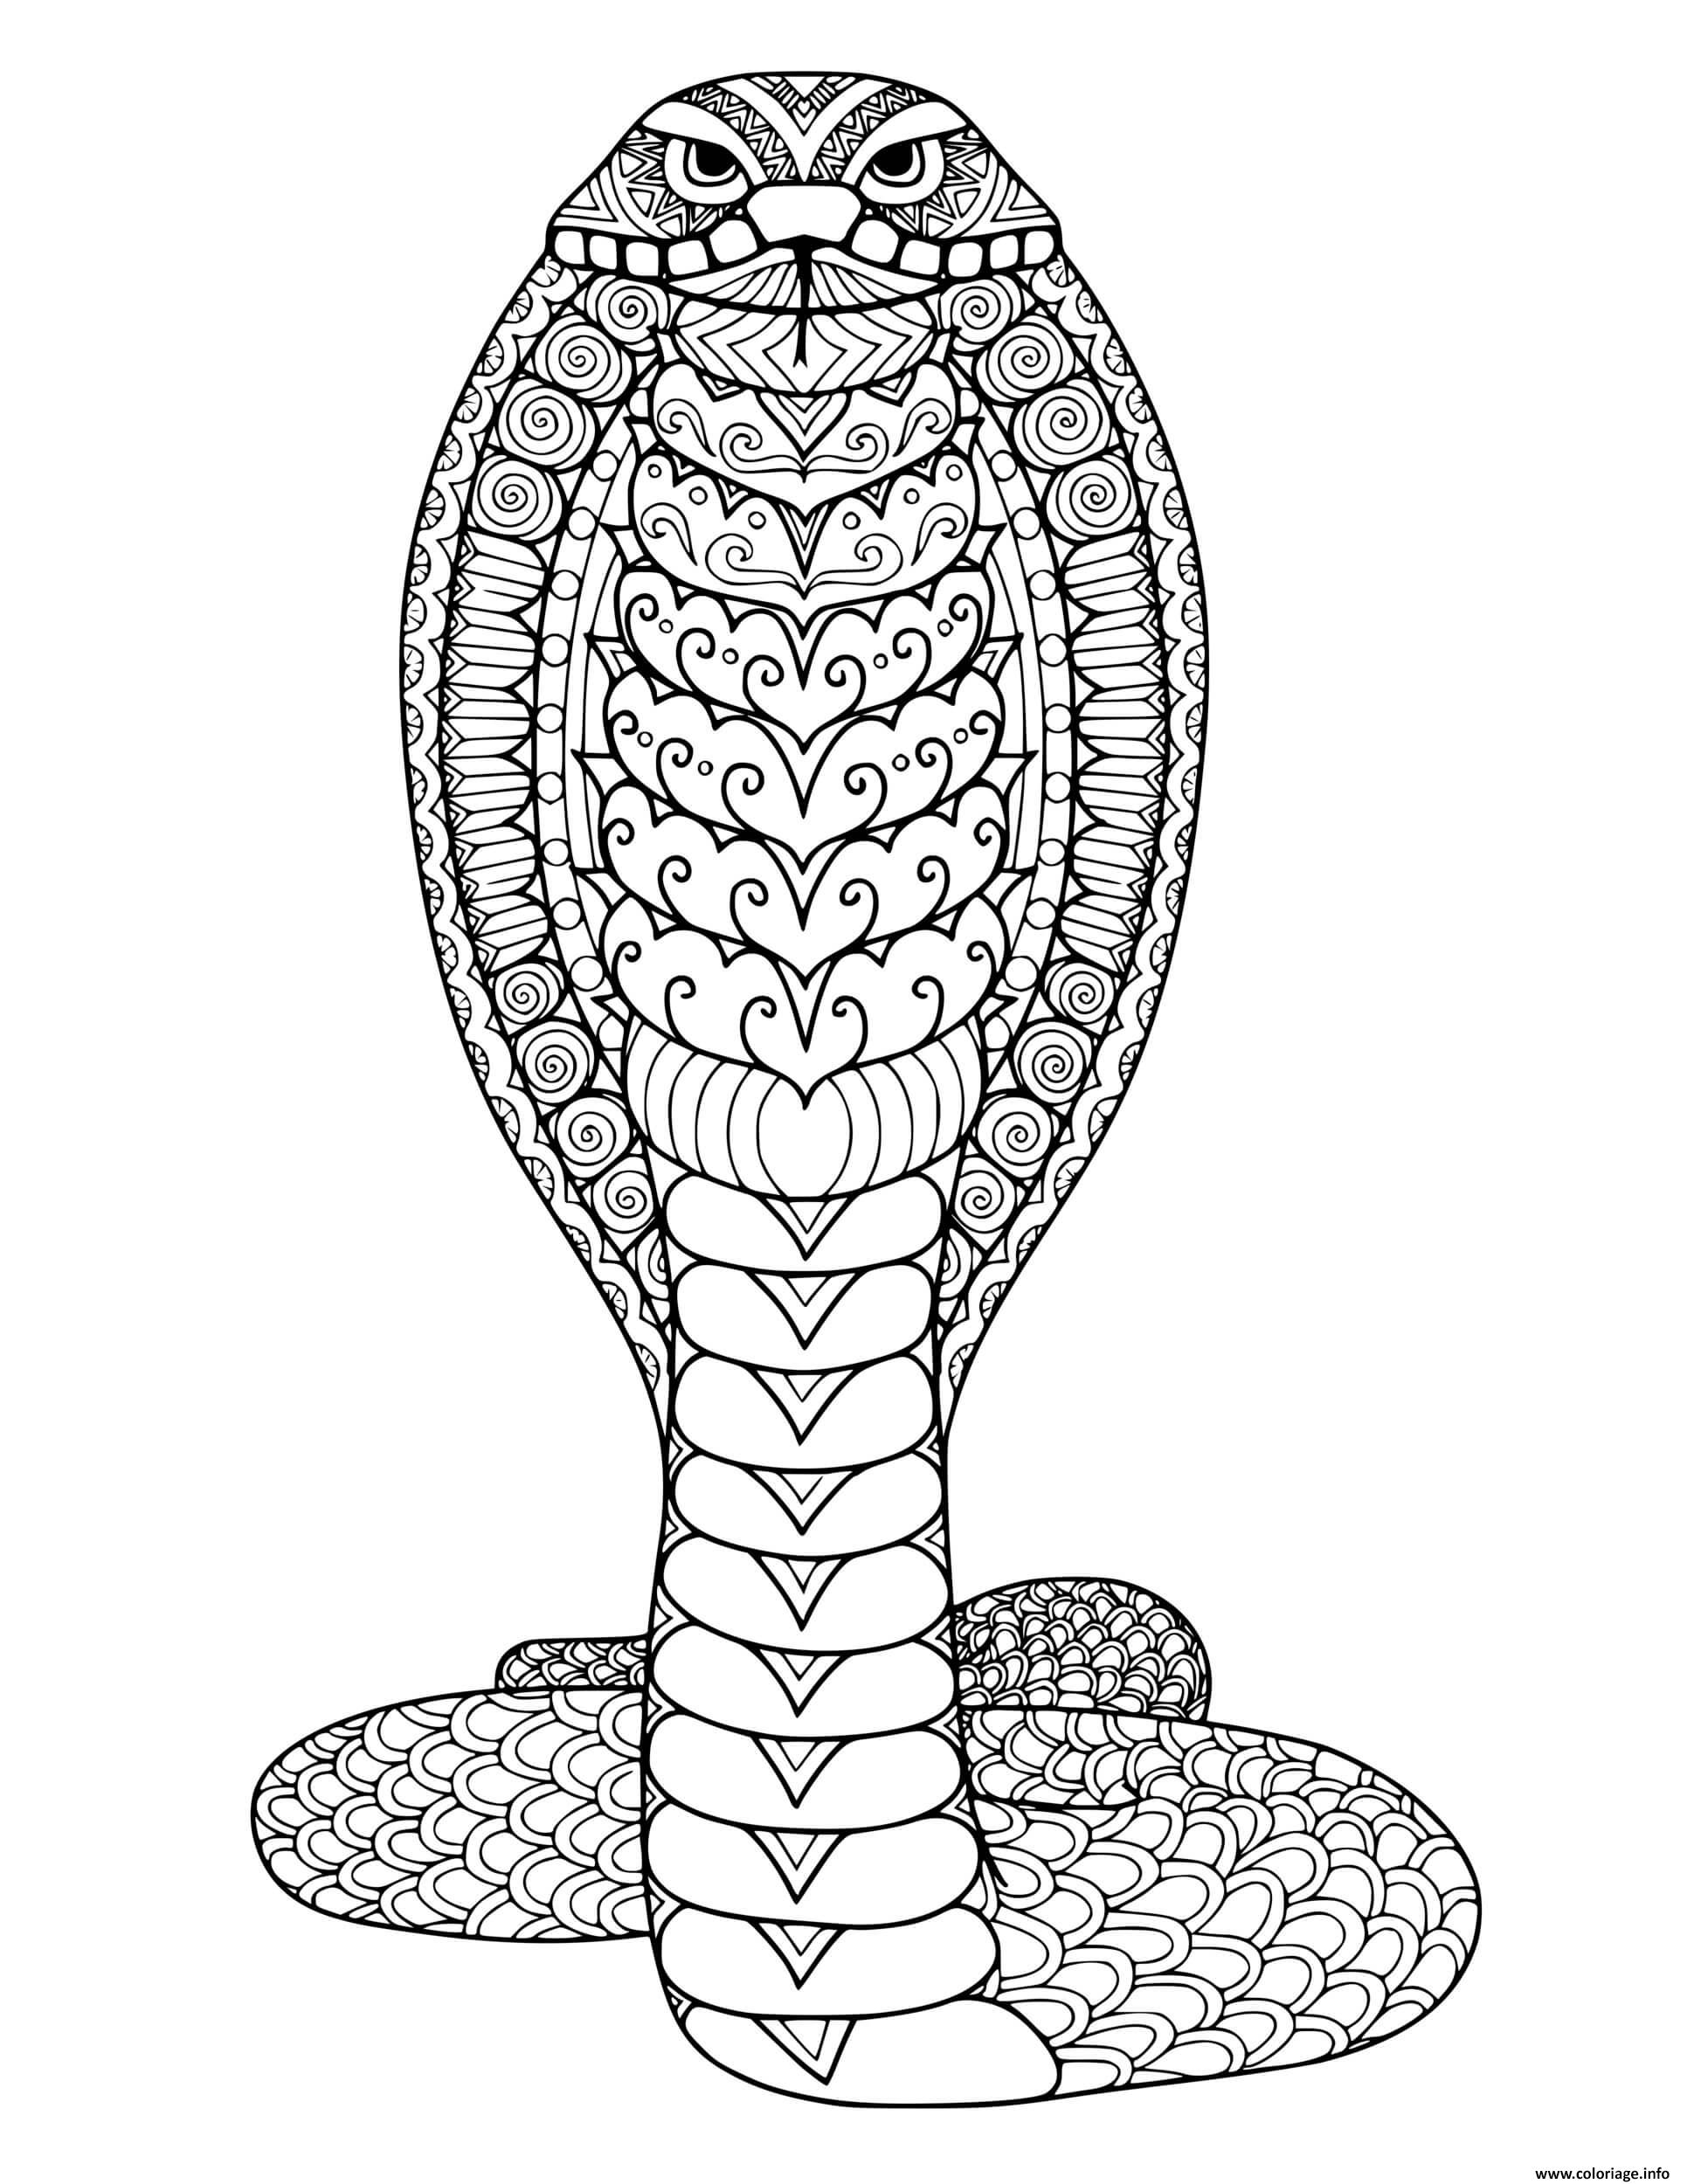 Dessin serpent mandala adulte Coloriage Gratuit à Imprimer